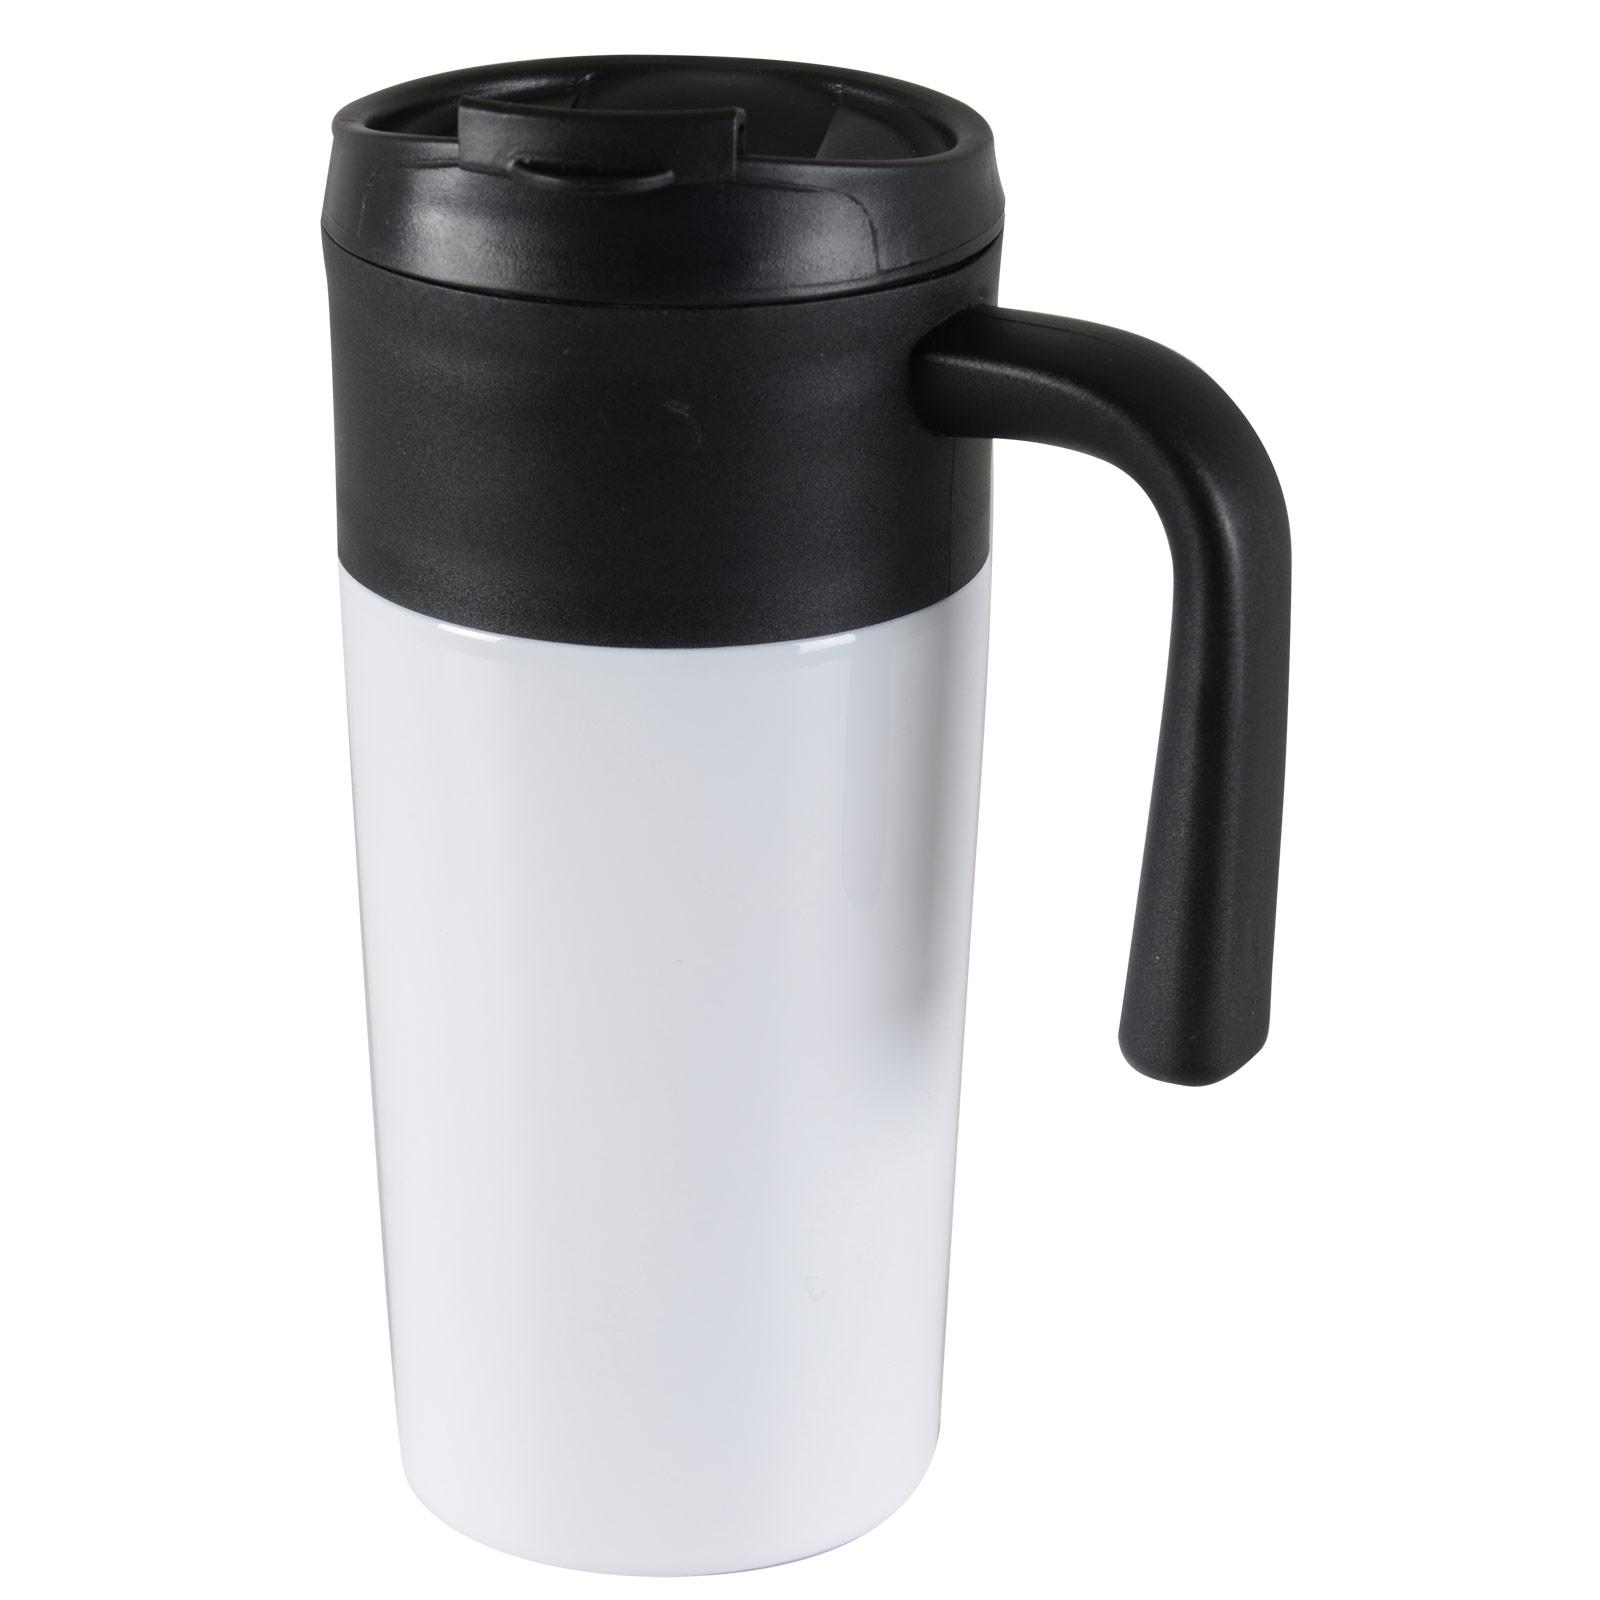 Tazza 450ml Thermal Mug Hot Warm Drinks Coffee Tea Travel Flask Cup Screw On Lid   eBay